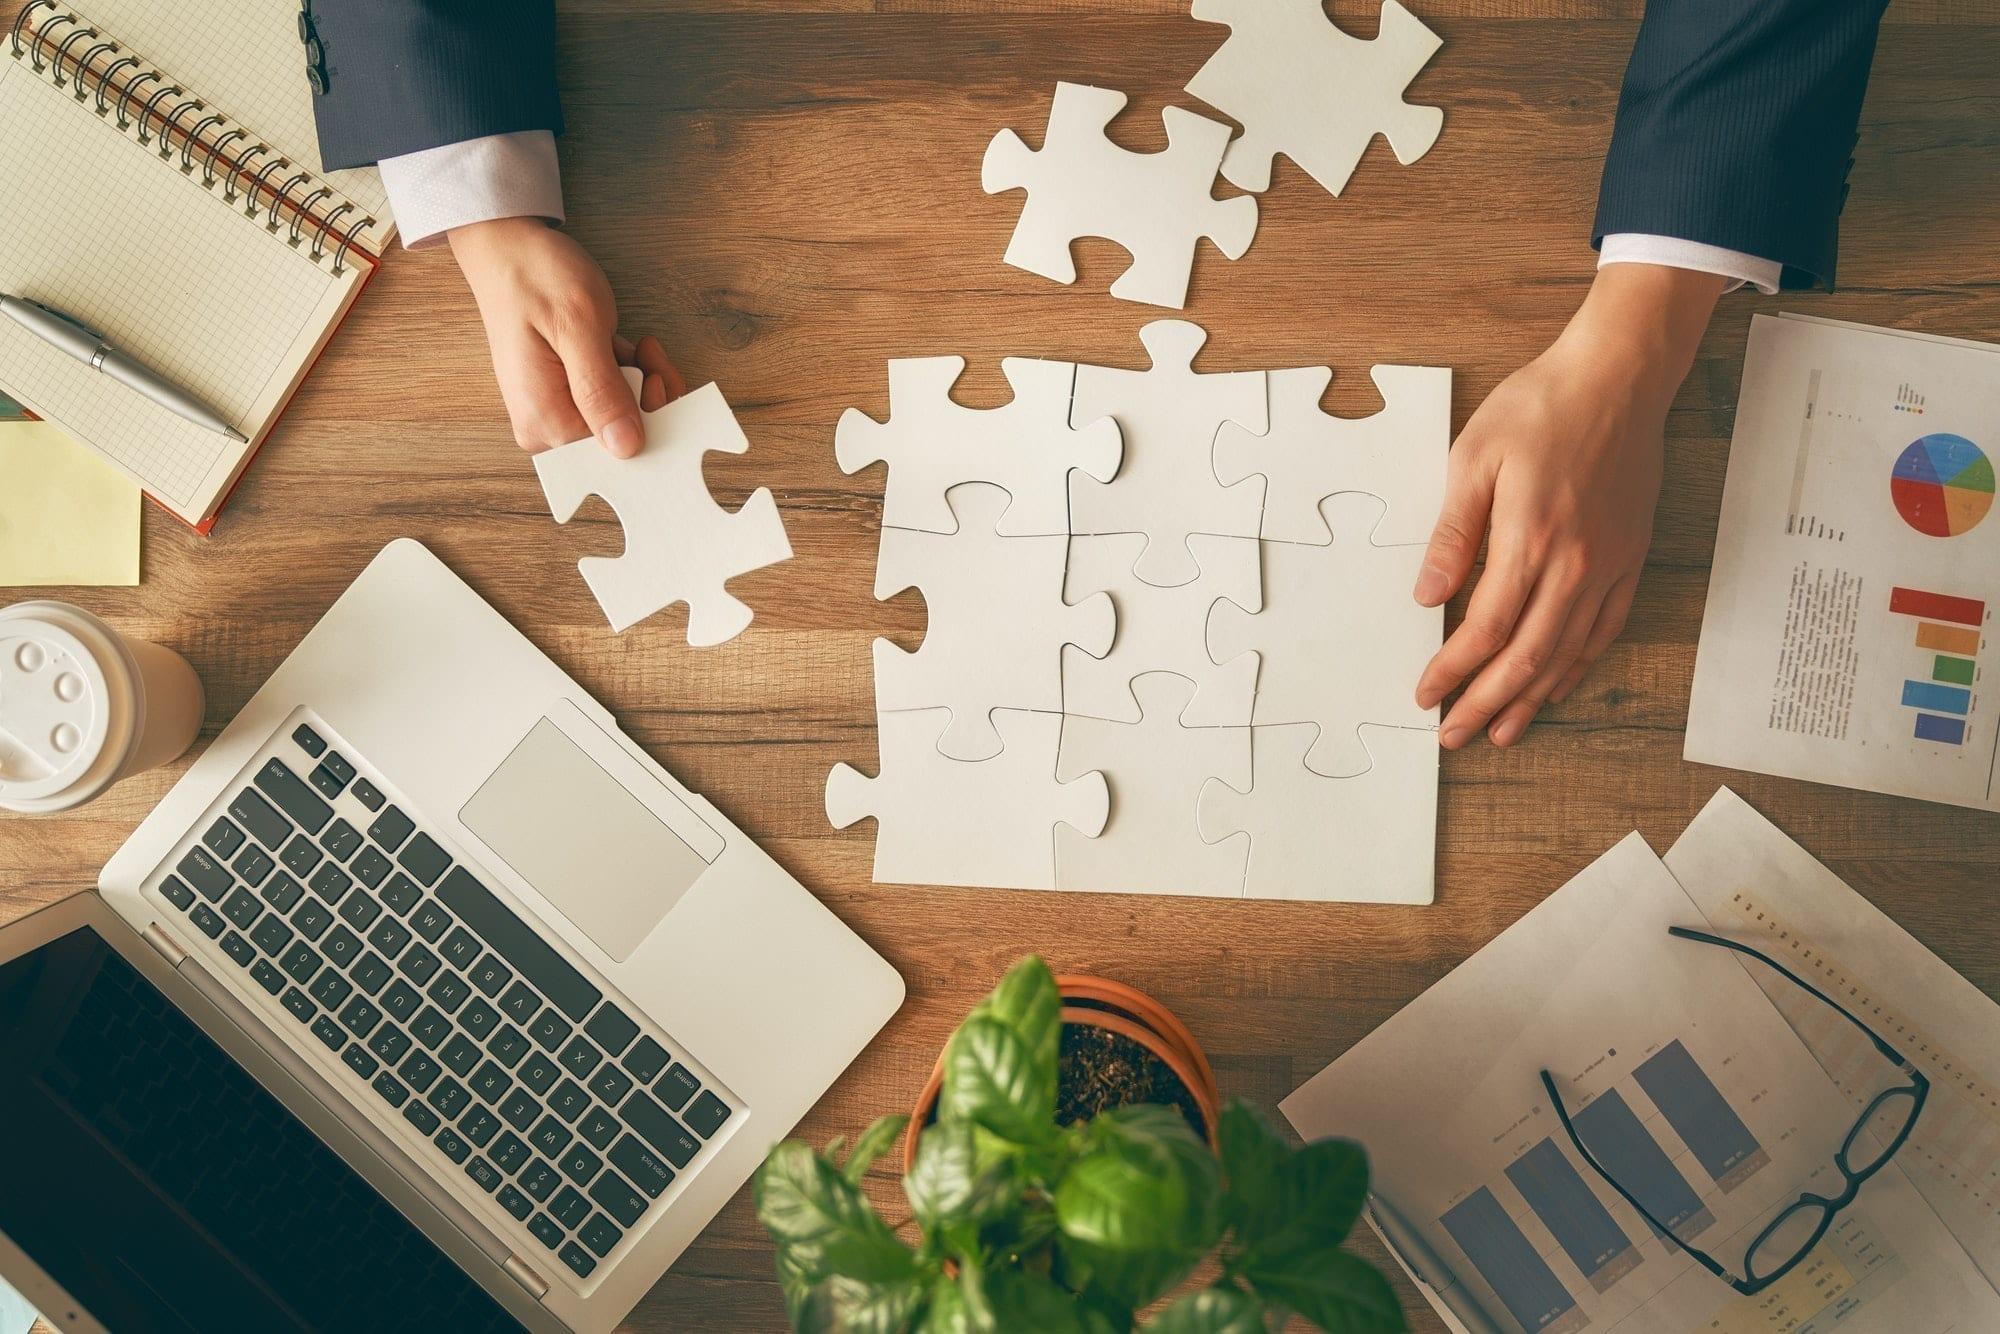 Businessman's hands putting together a paper jigsaw